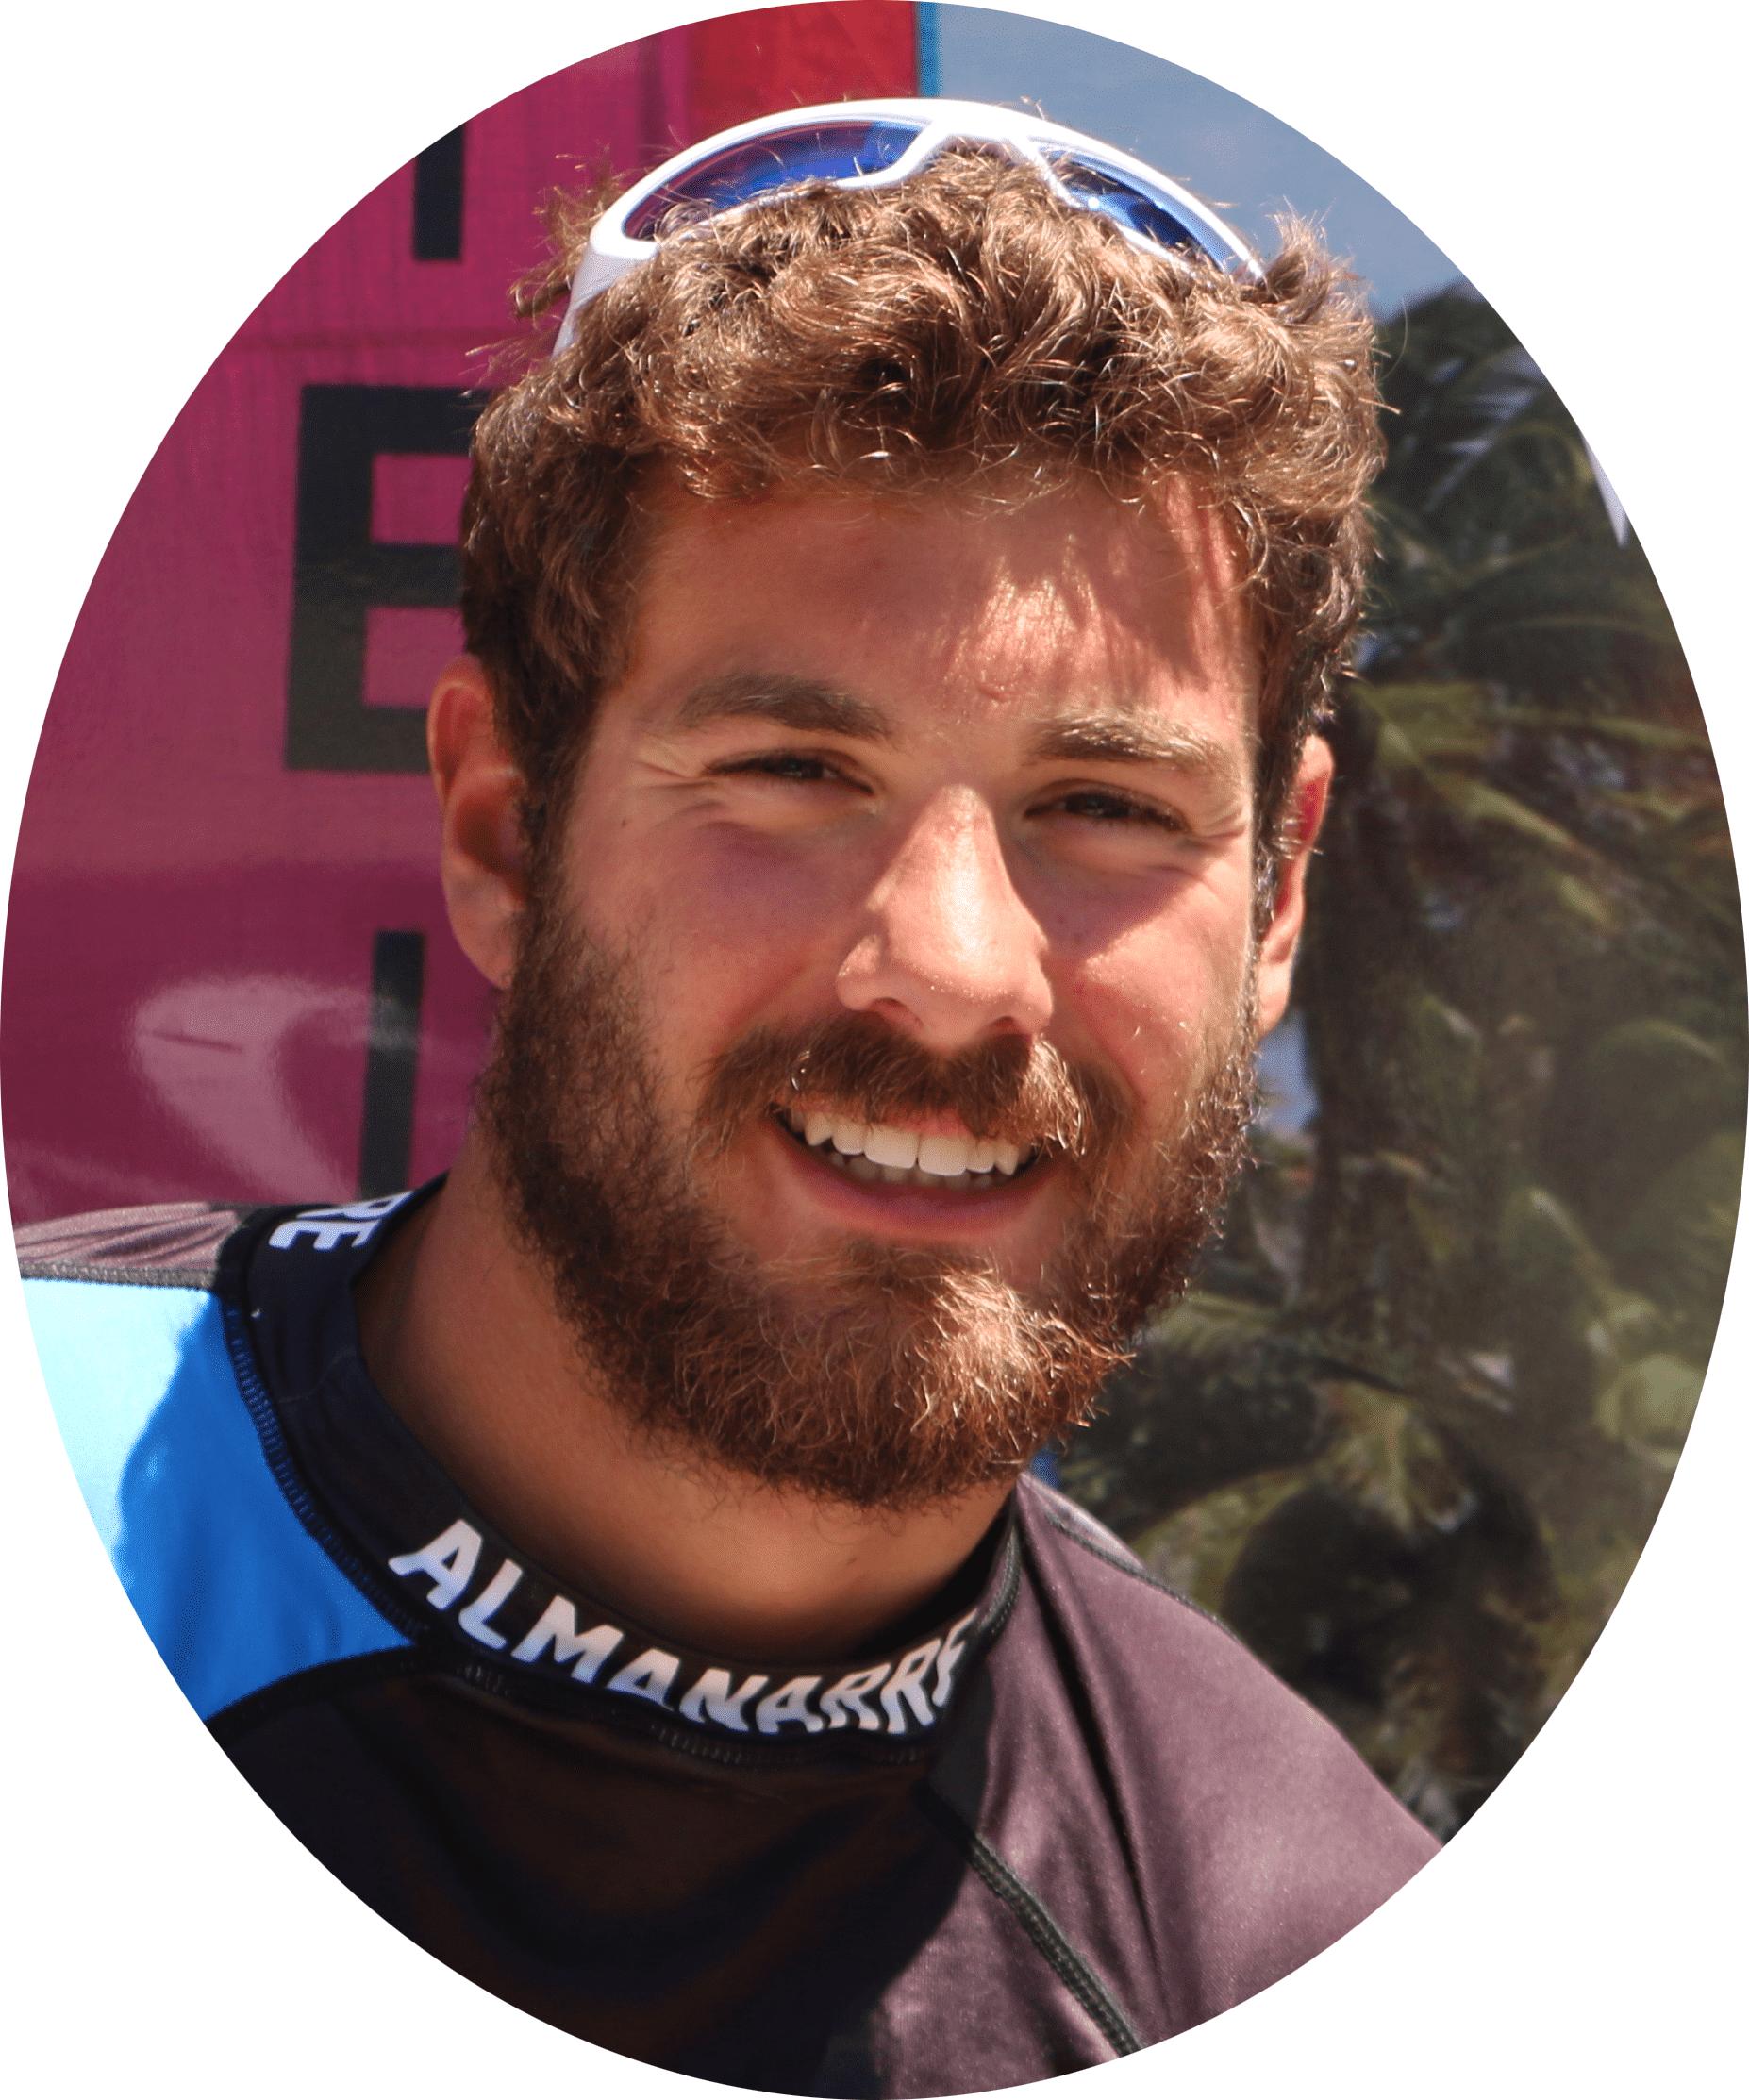 Moniteur-cours-de-kitesurf-Benoît-min